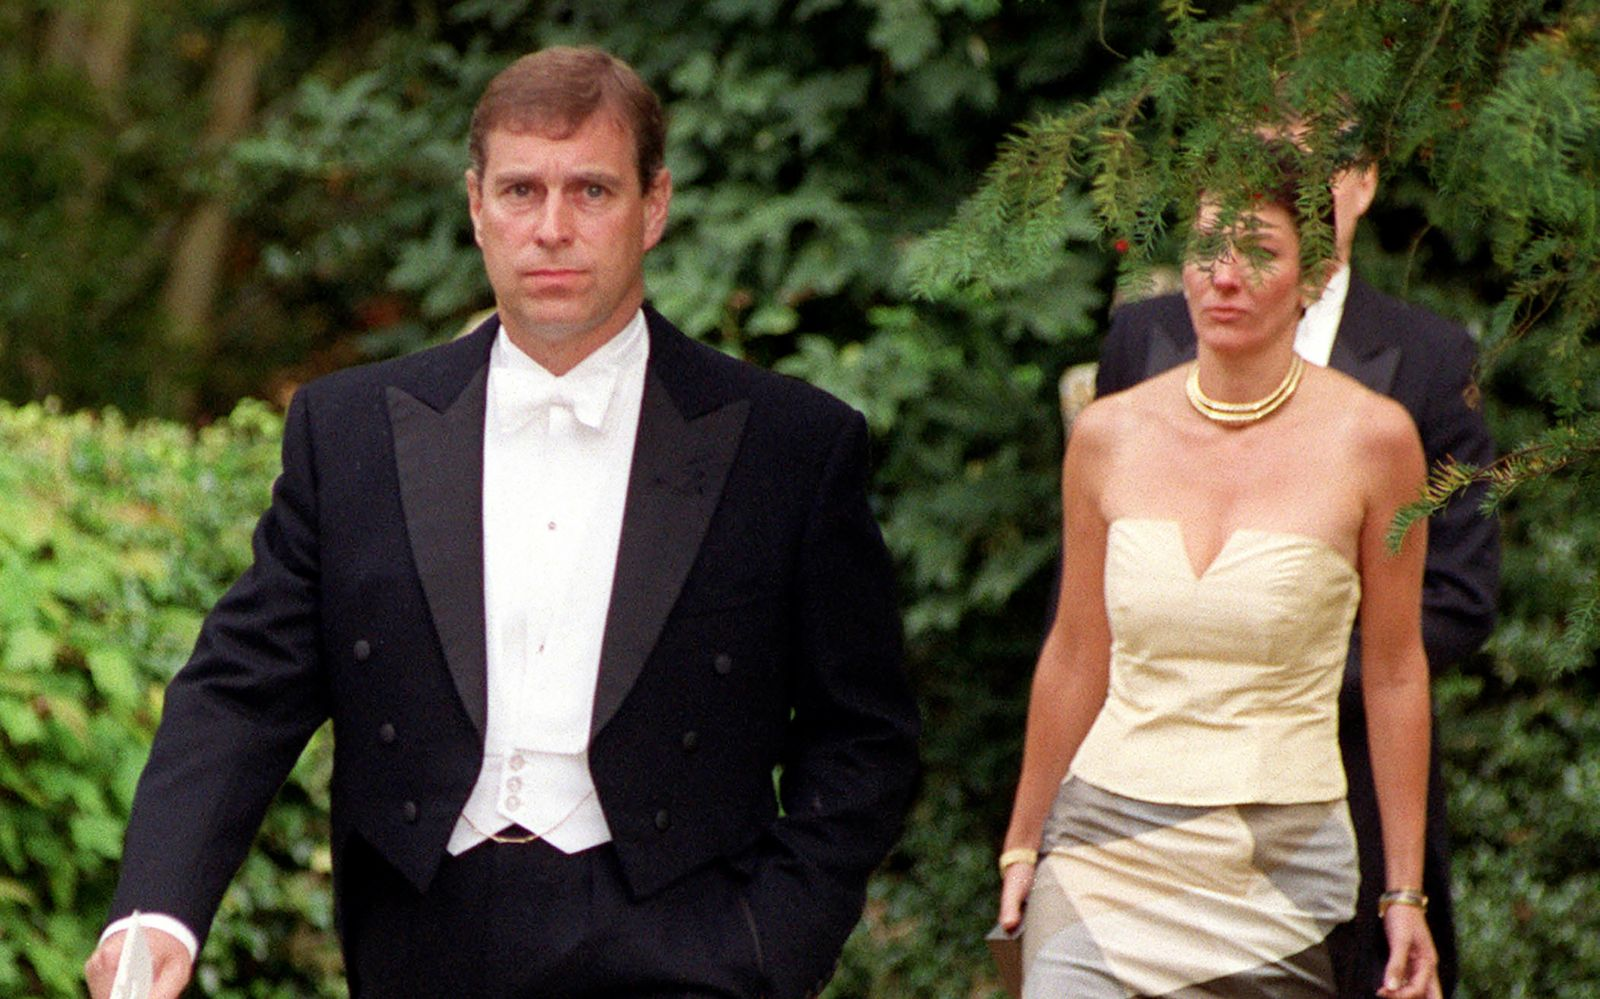 Prince Andrew & Ghislaine Maxwell